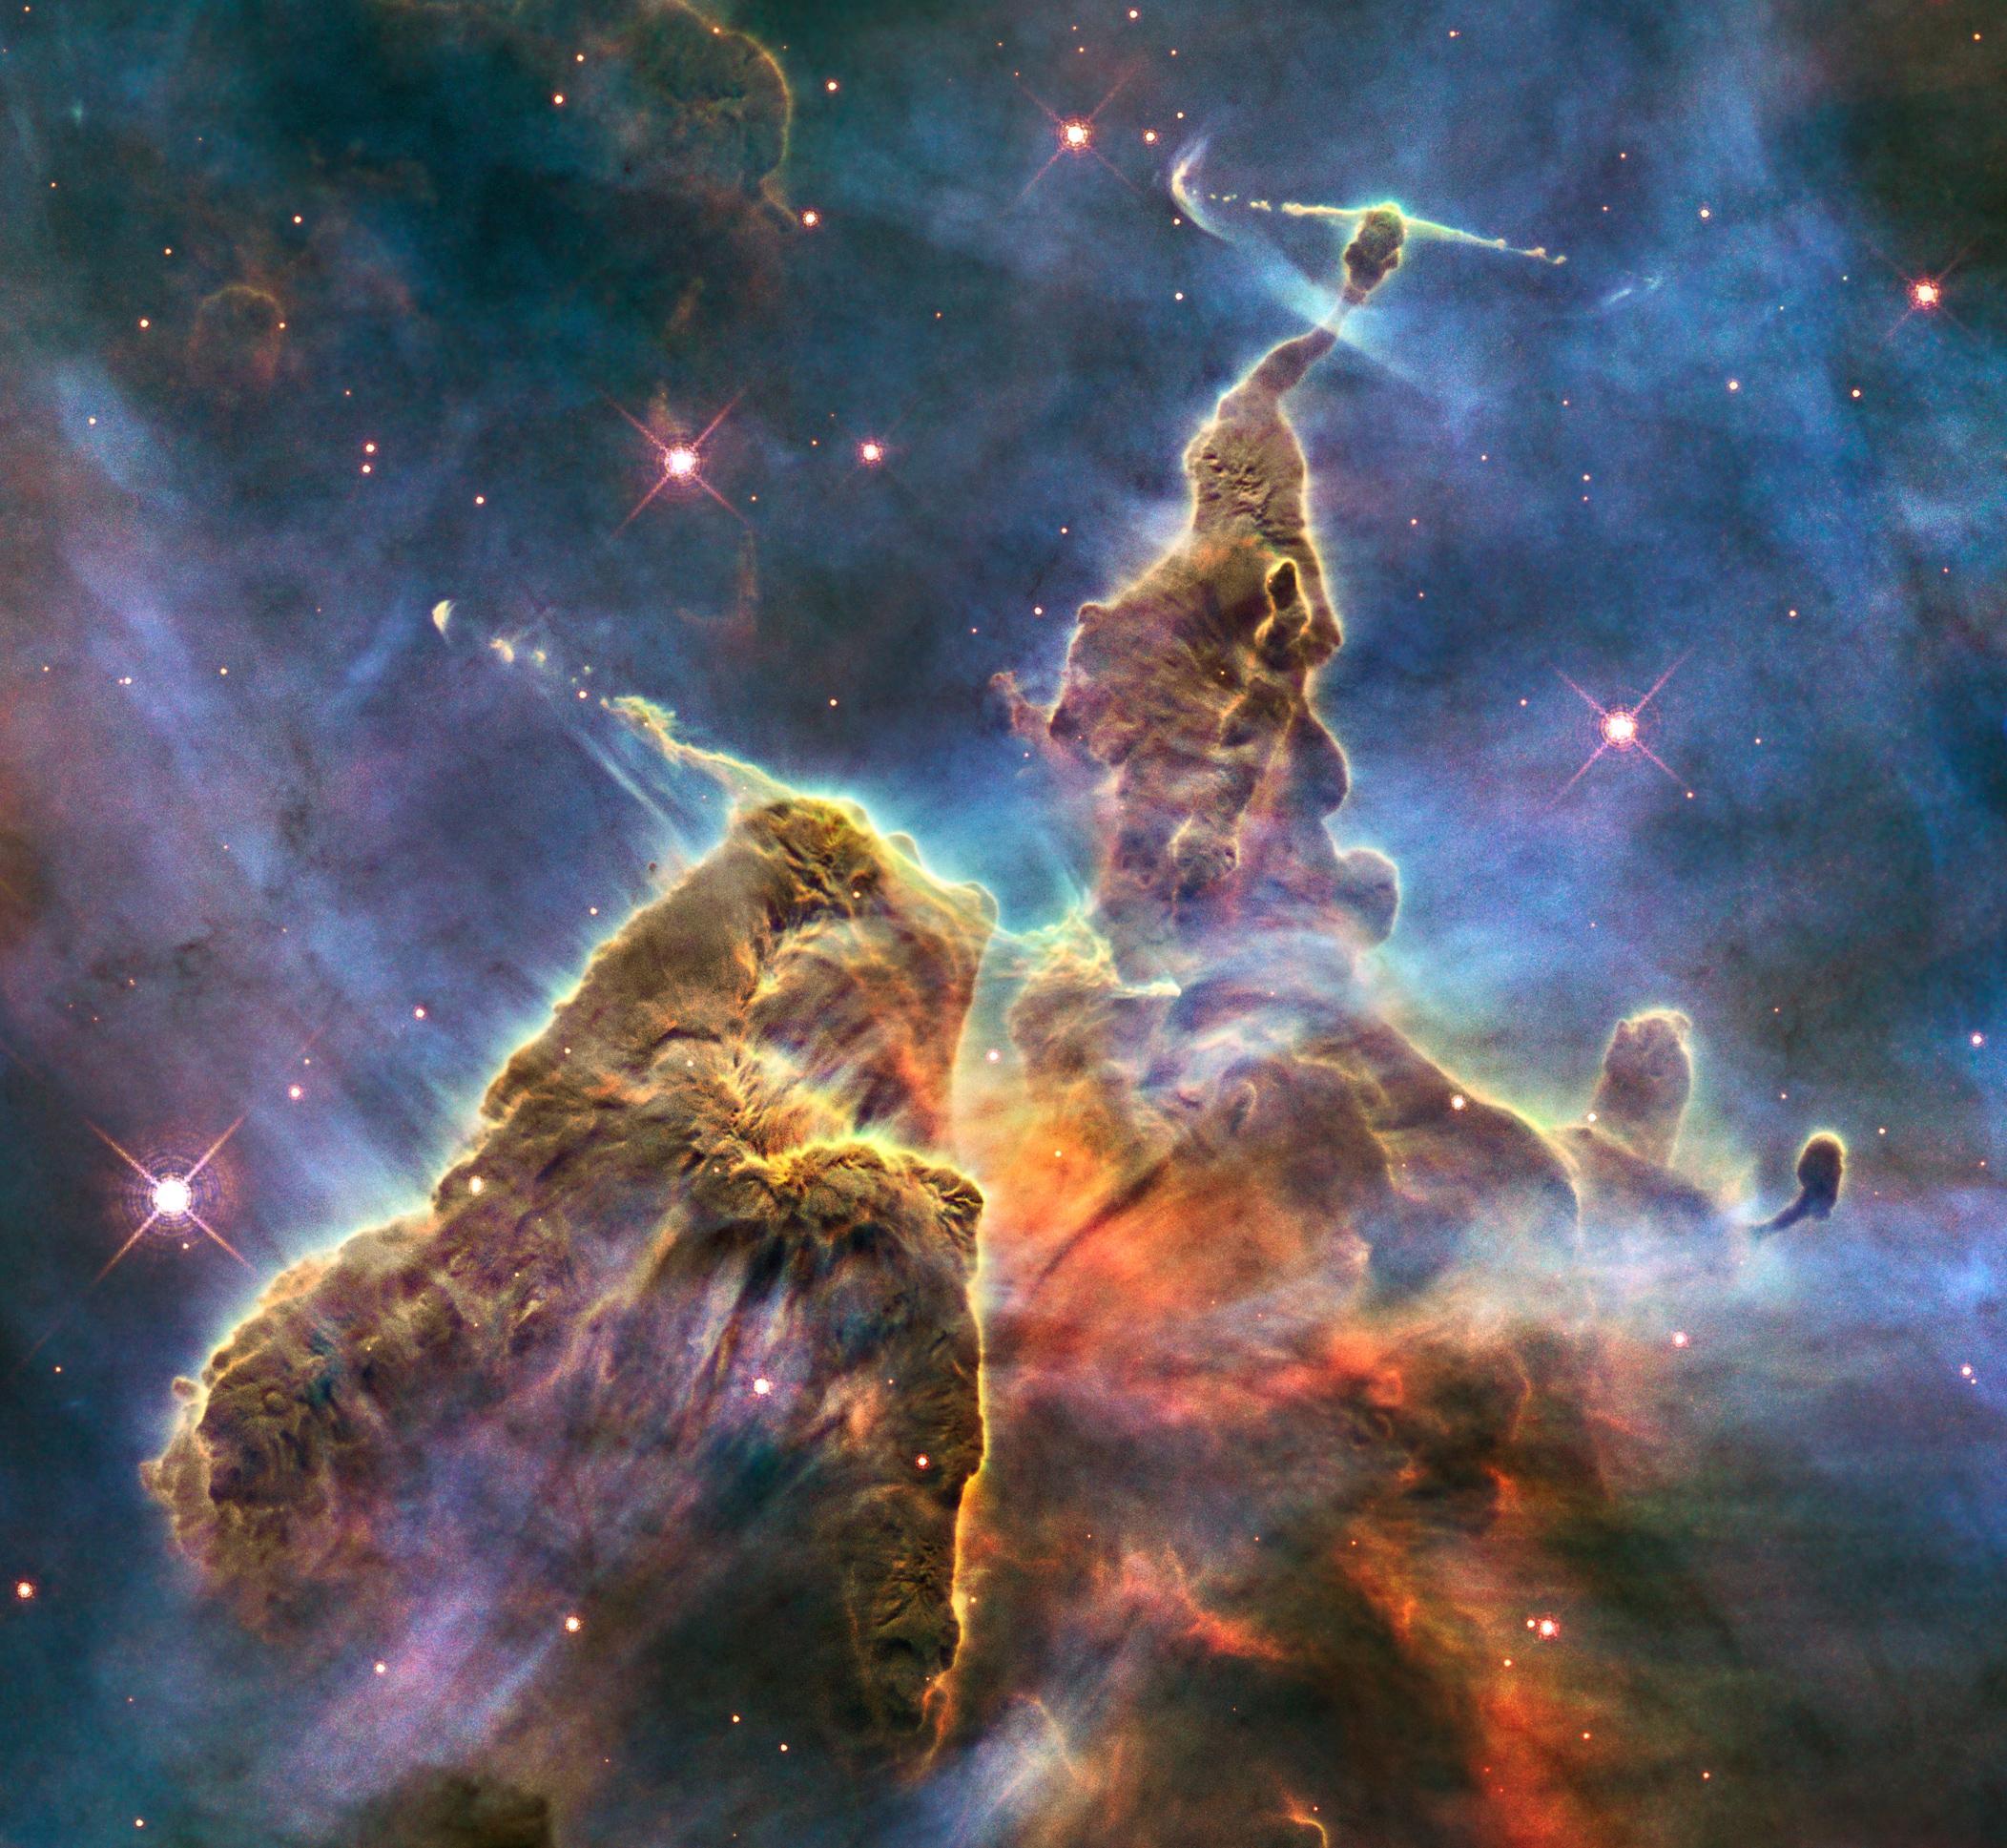 HUBBLE'S TOP 100 •#28 •Credit: NASA, ESA, M. Livio and the Hubble 20th Anniversary Team (STScI)